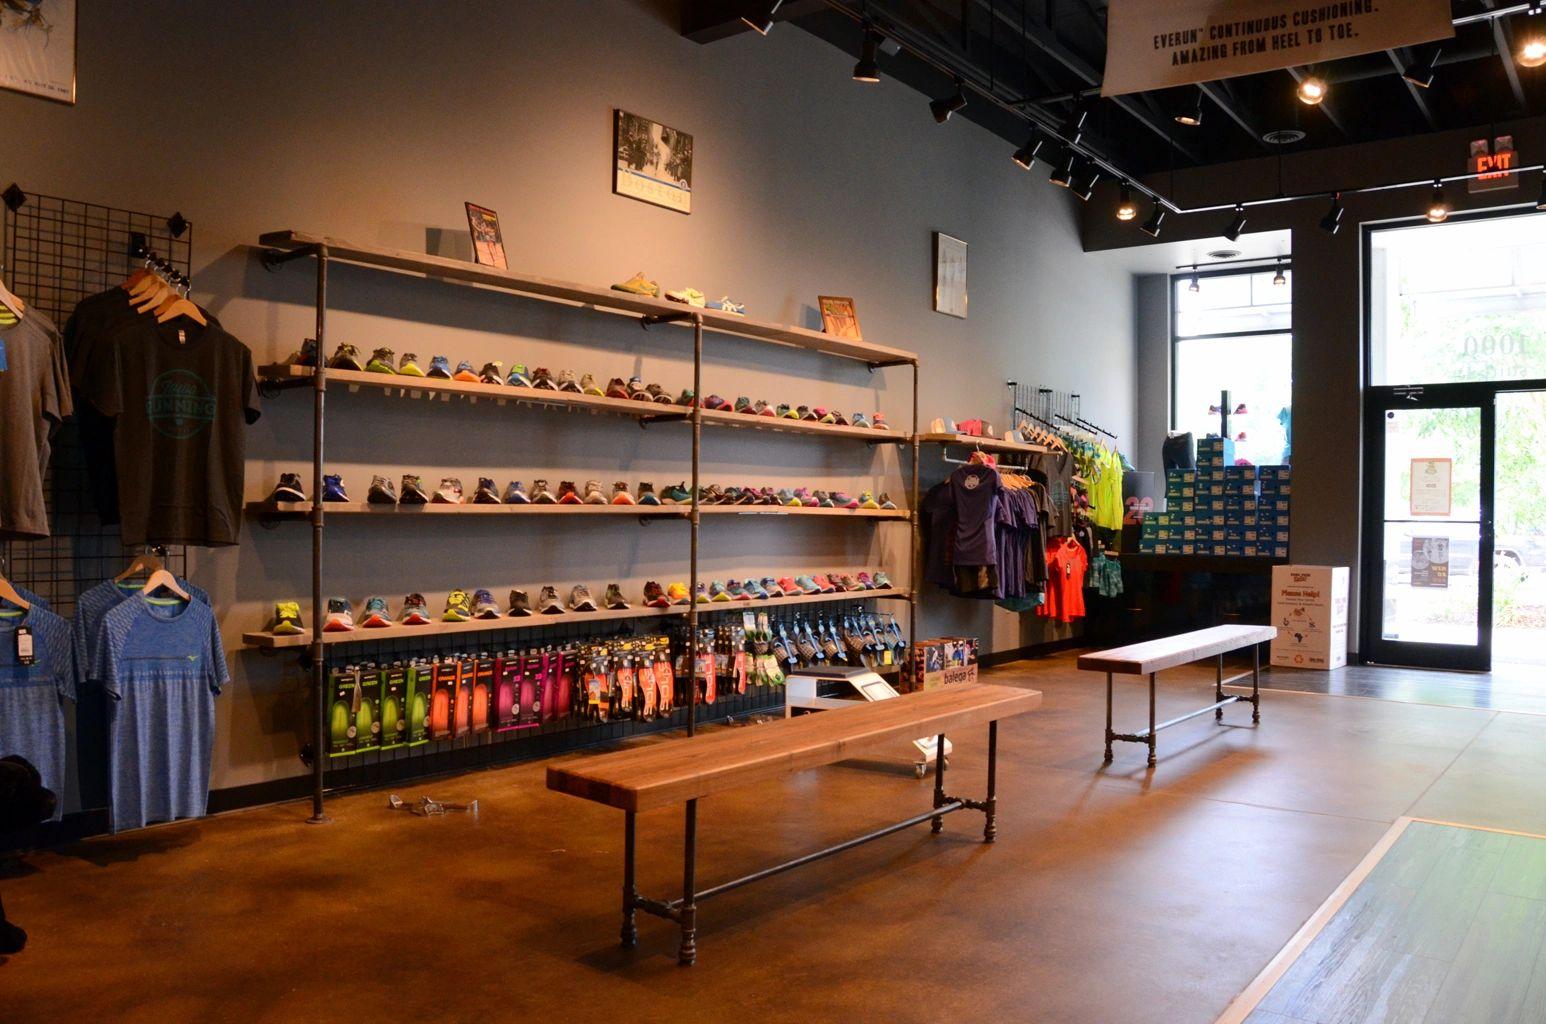 Iowa Running Company - Run Specialty, Shoe Store